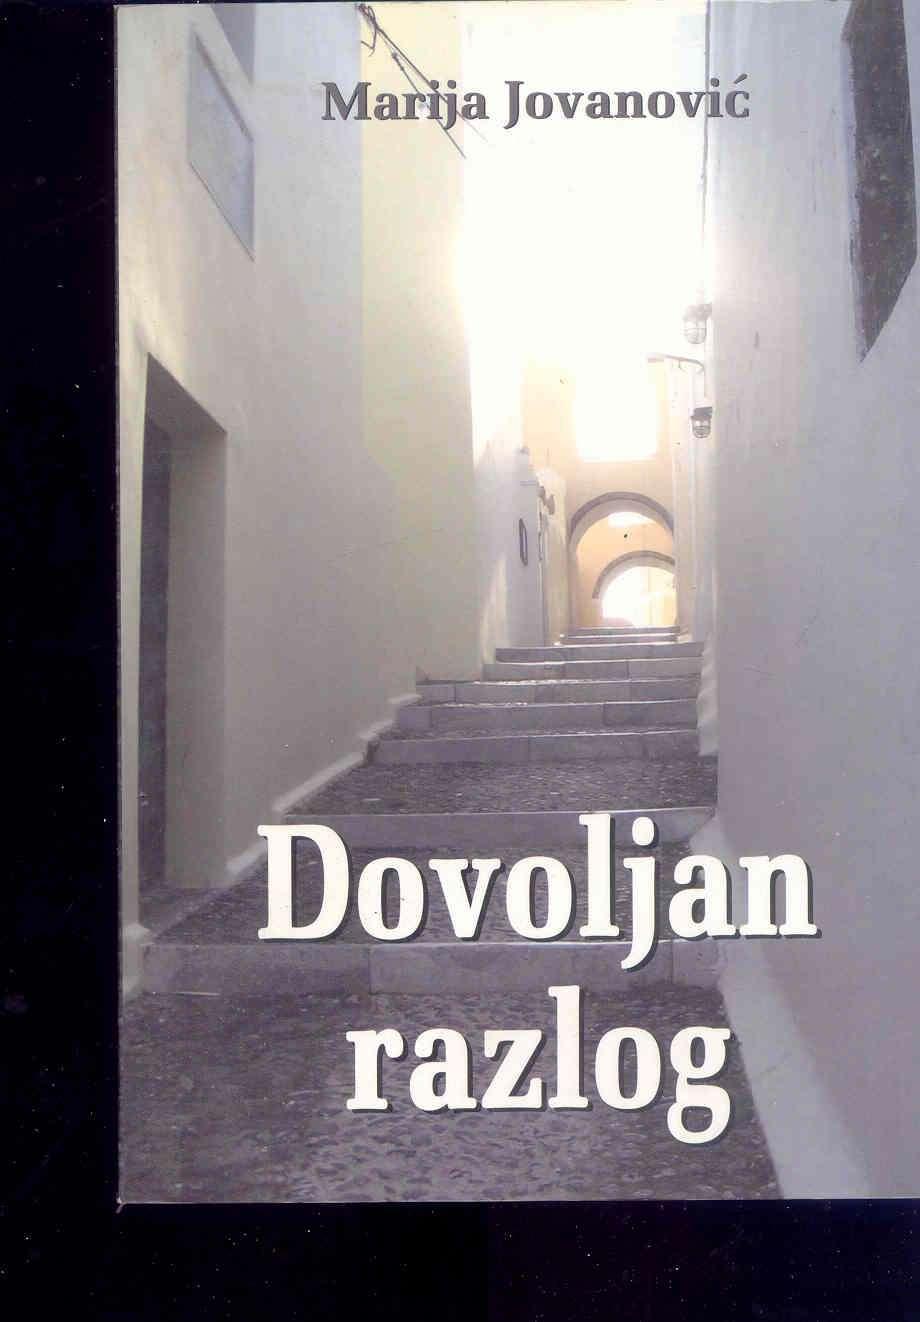 MARIJA JOVANOVIC DOVOLJAN RAZLOG PDF